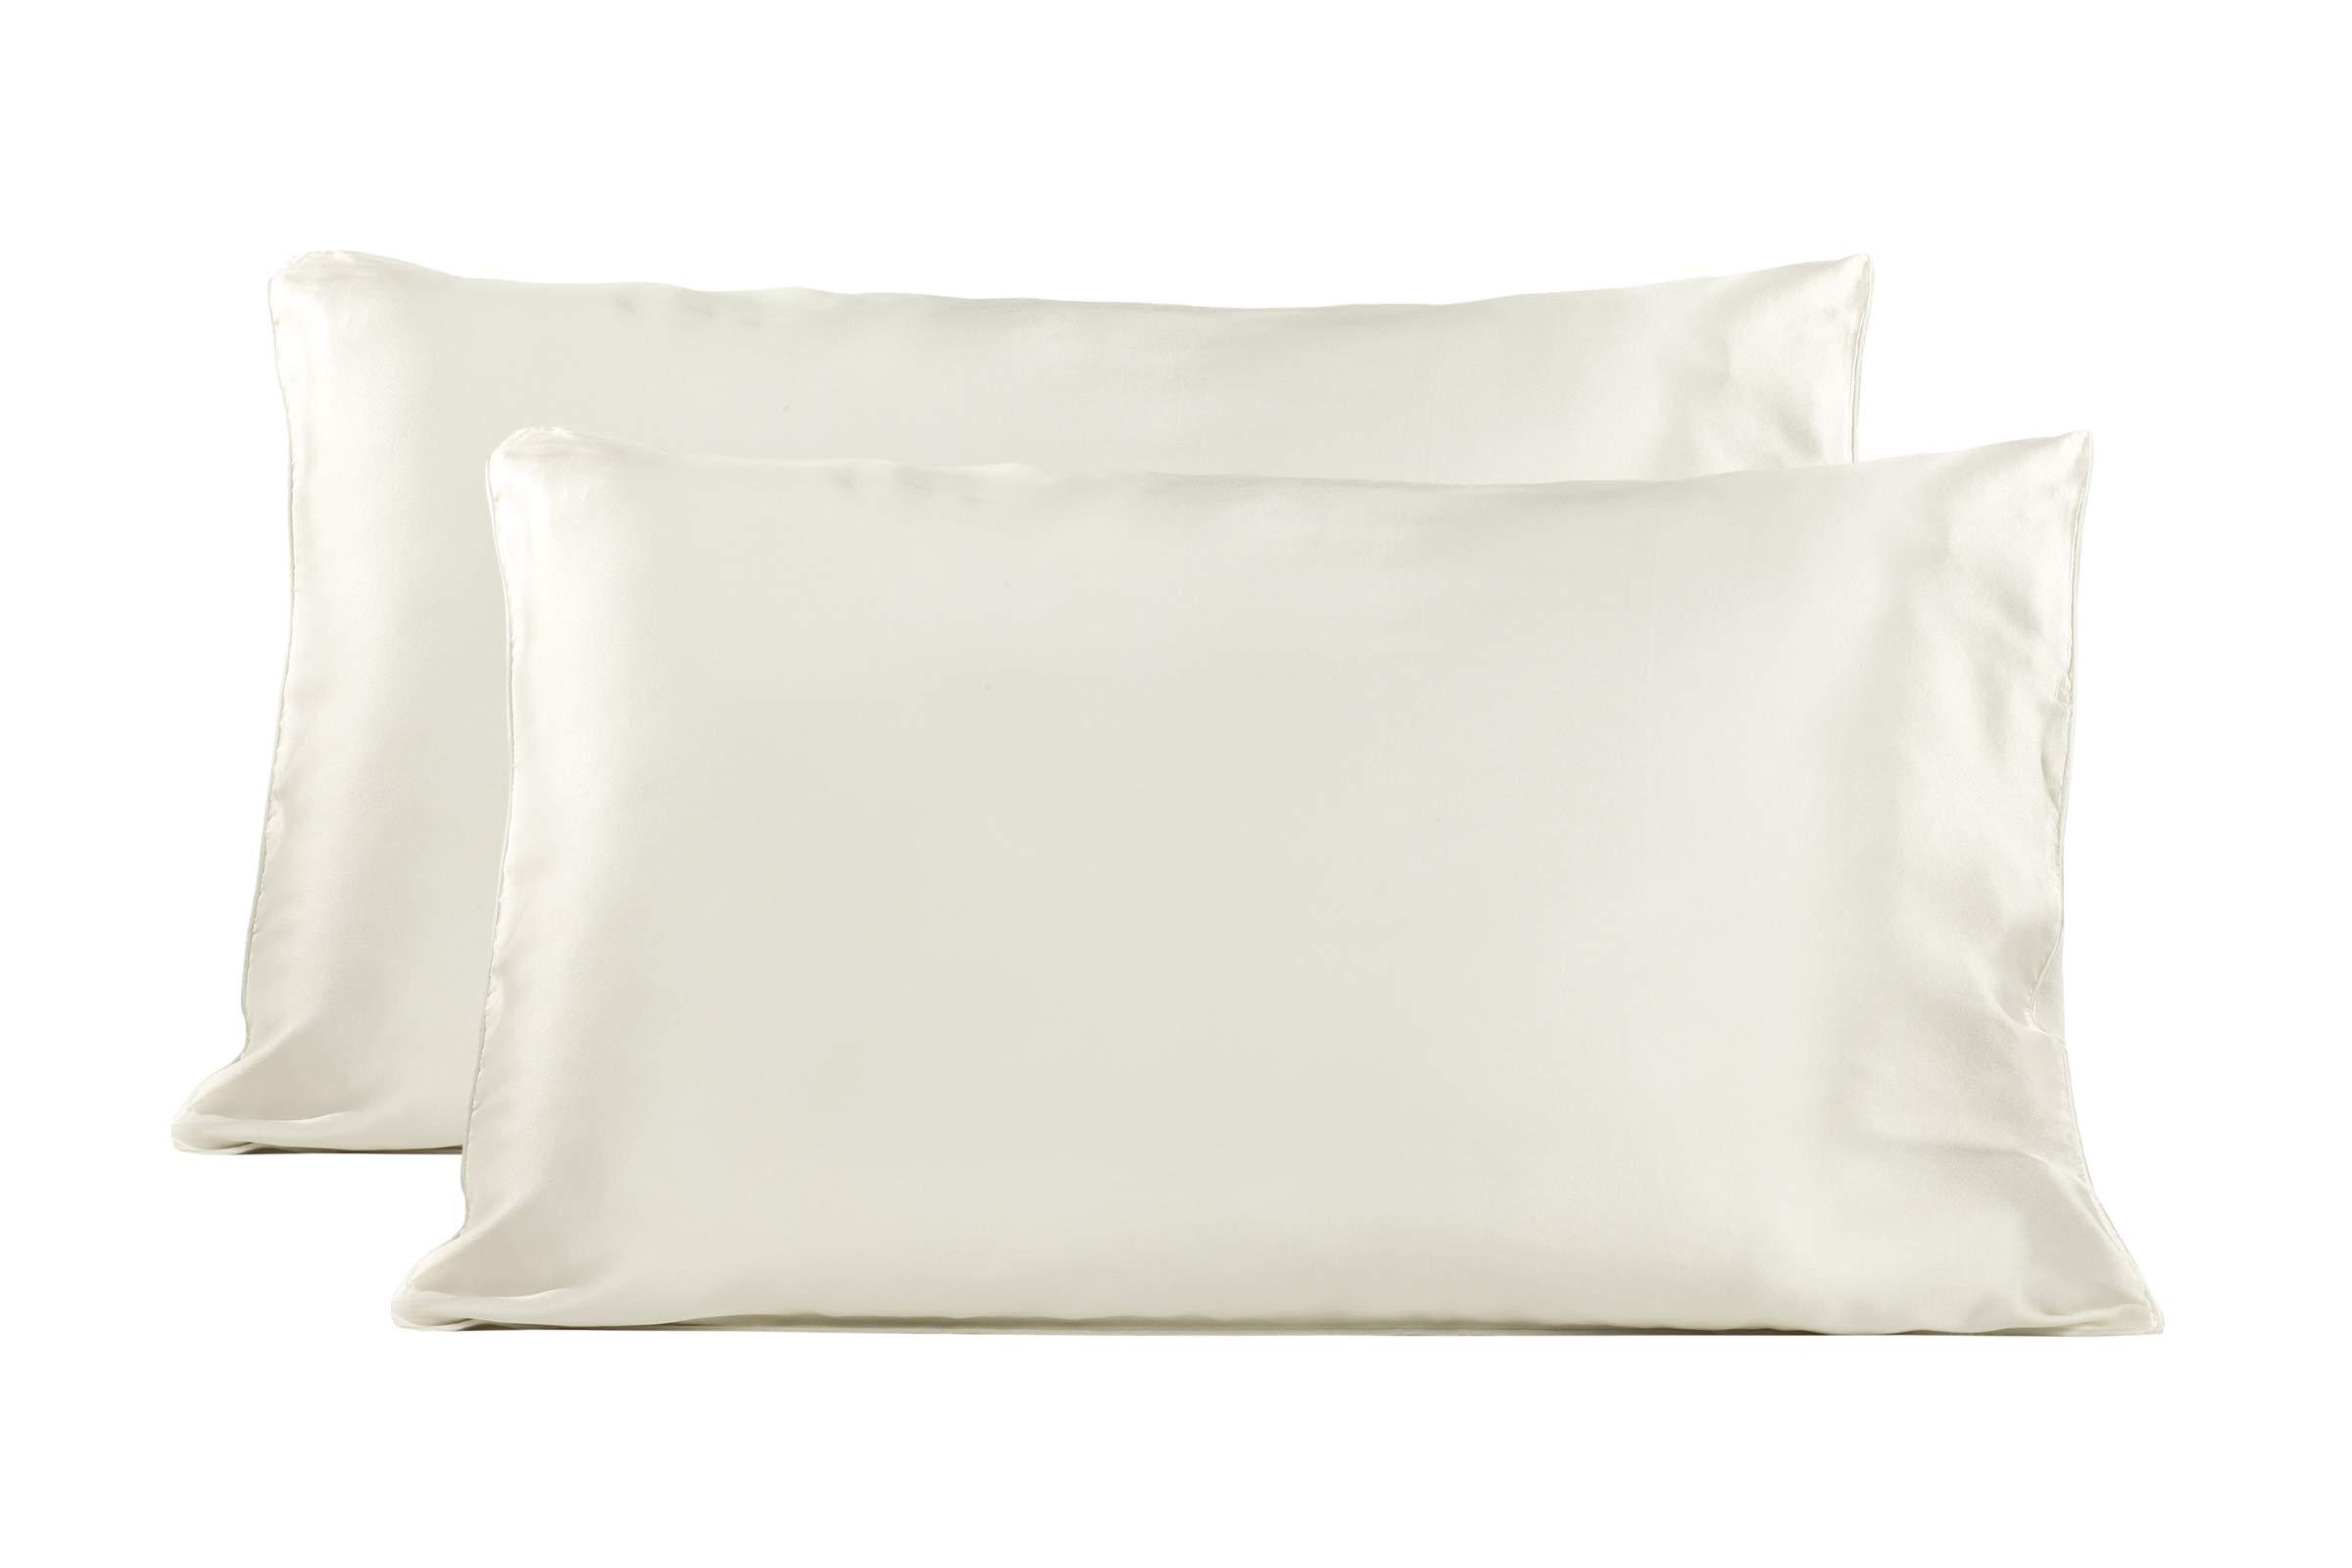 TexereSilk Mulberry Silk Pillowcase (2-Pack, Natural White 2 PK, Q) Gift for Mom